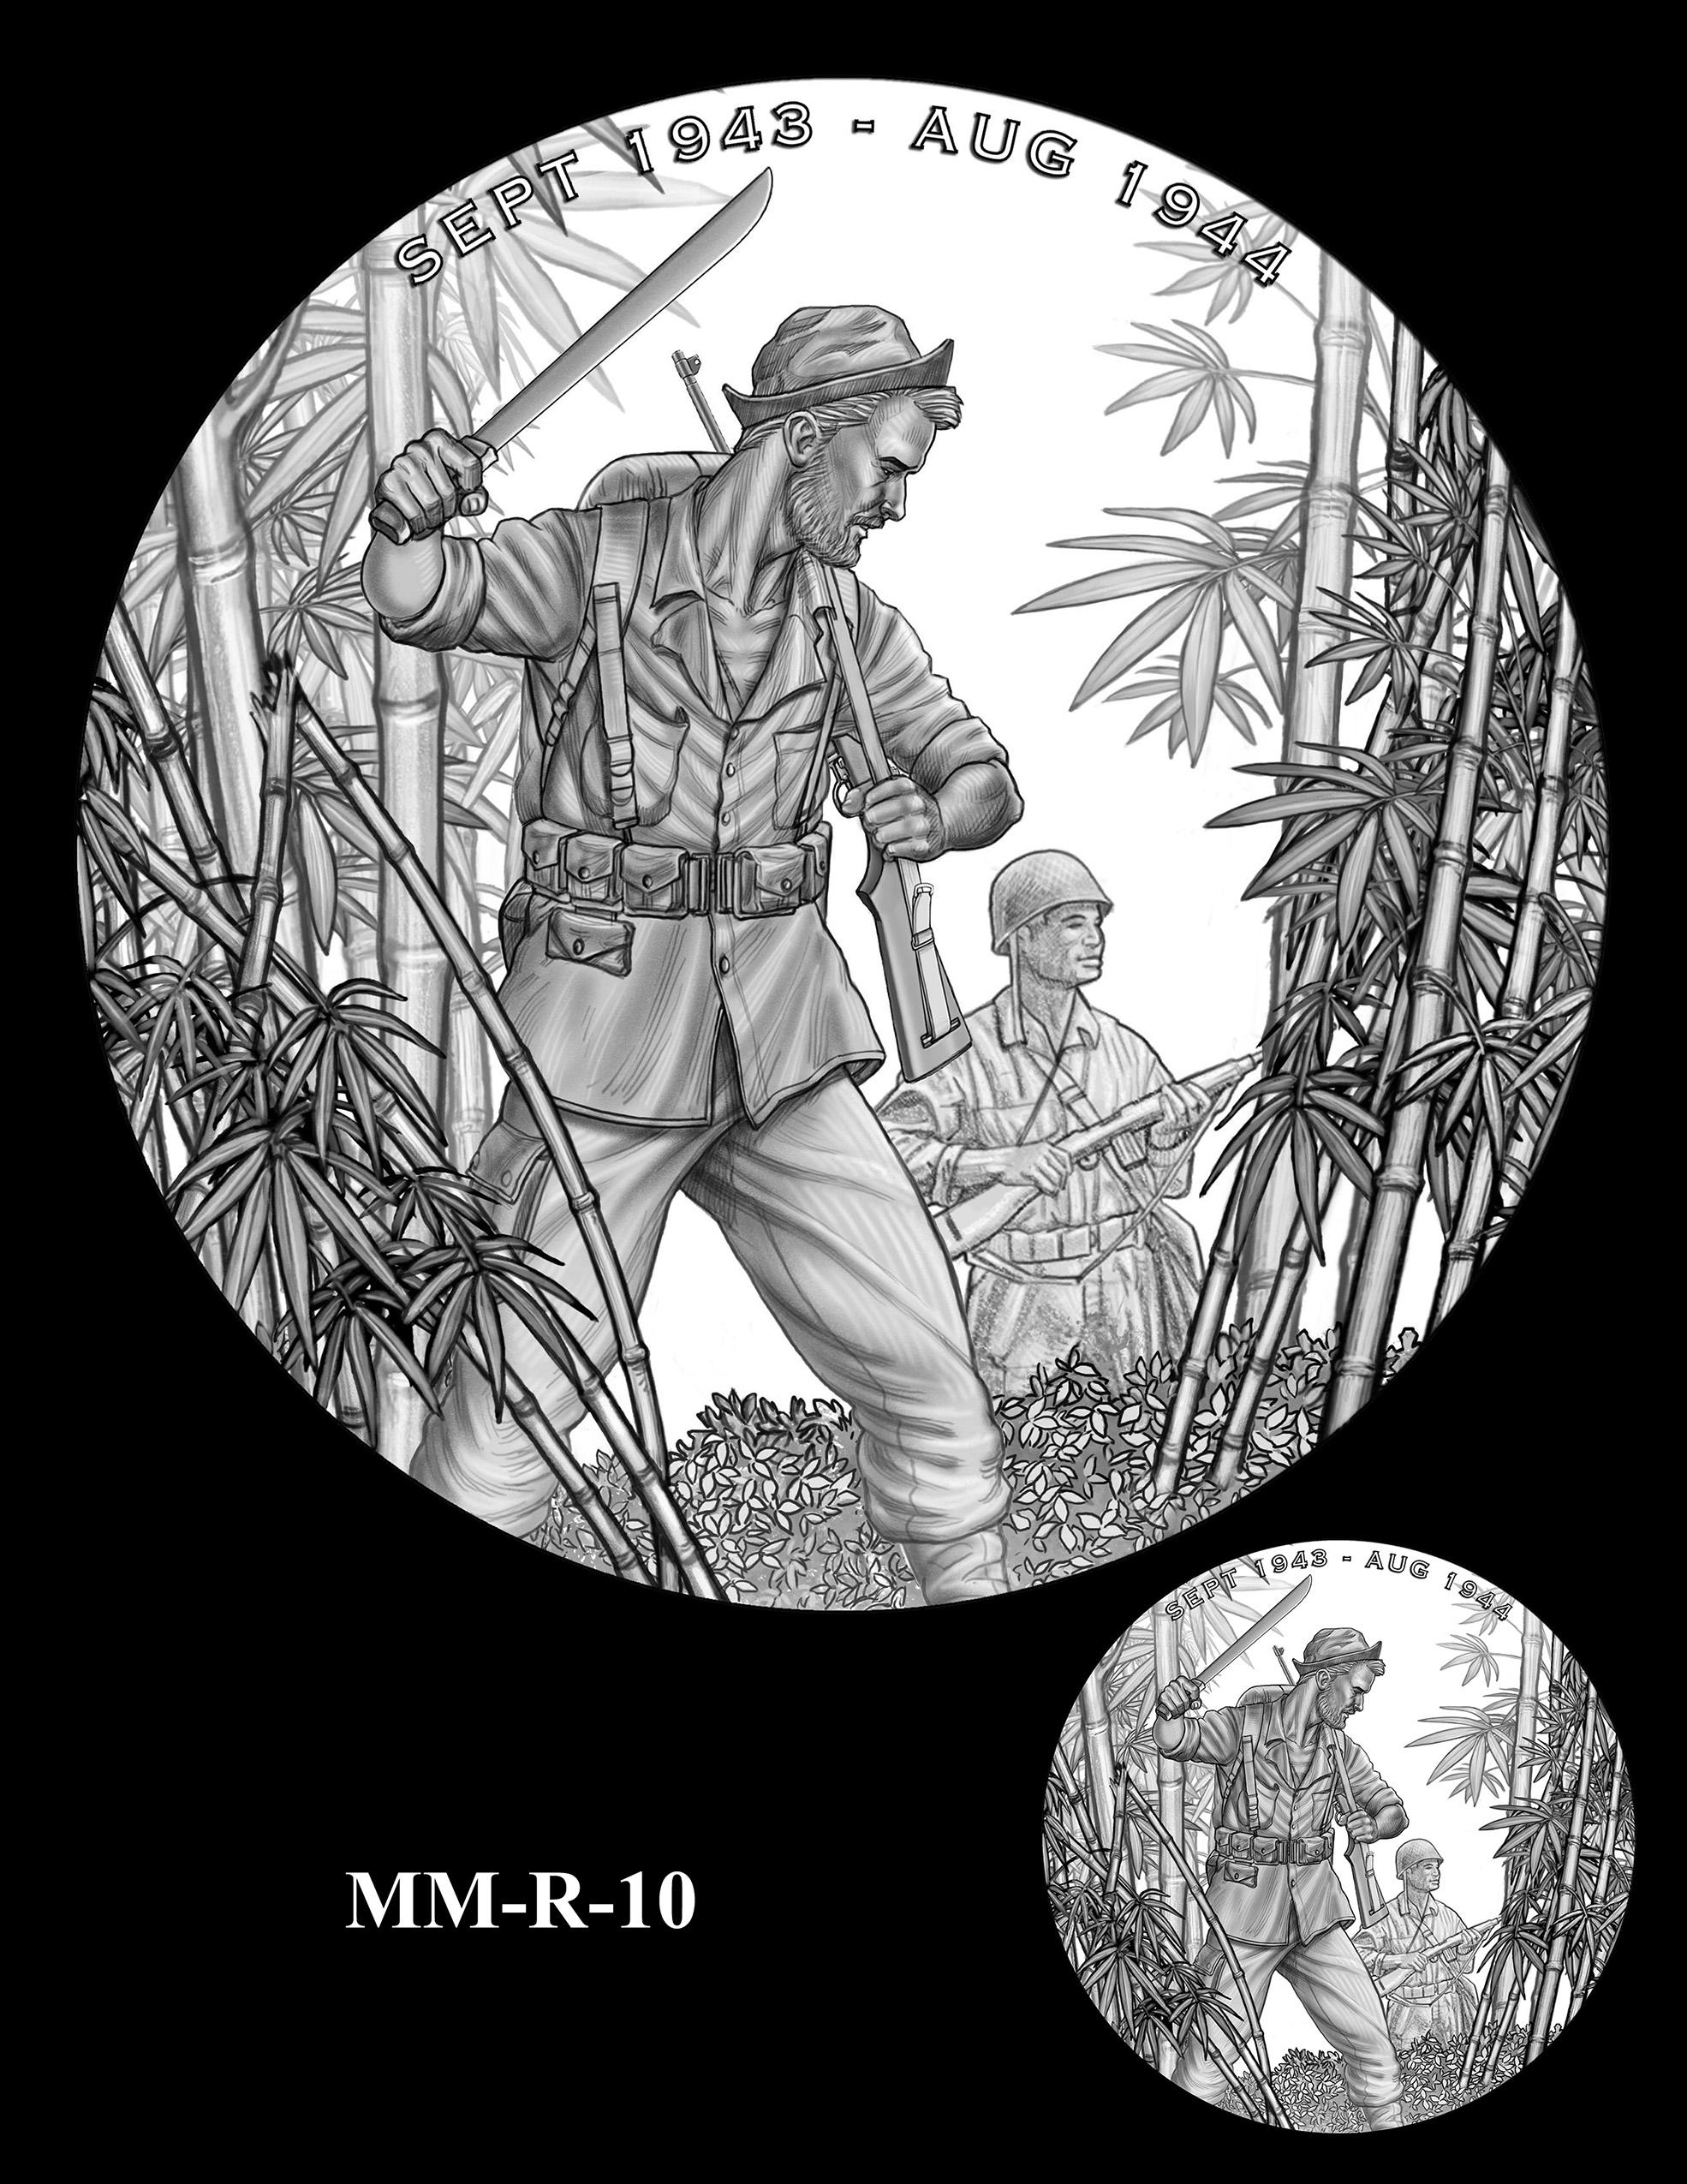 MM-R-10 -- Merrill's Marauders Congressional Gold Medal